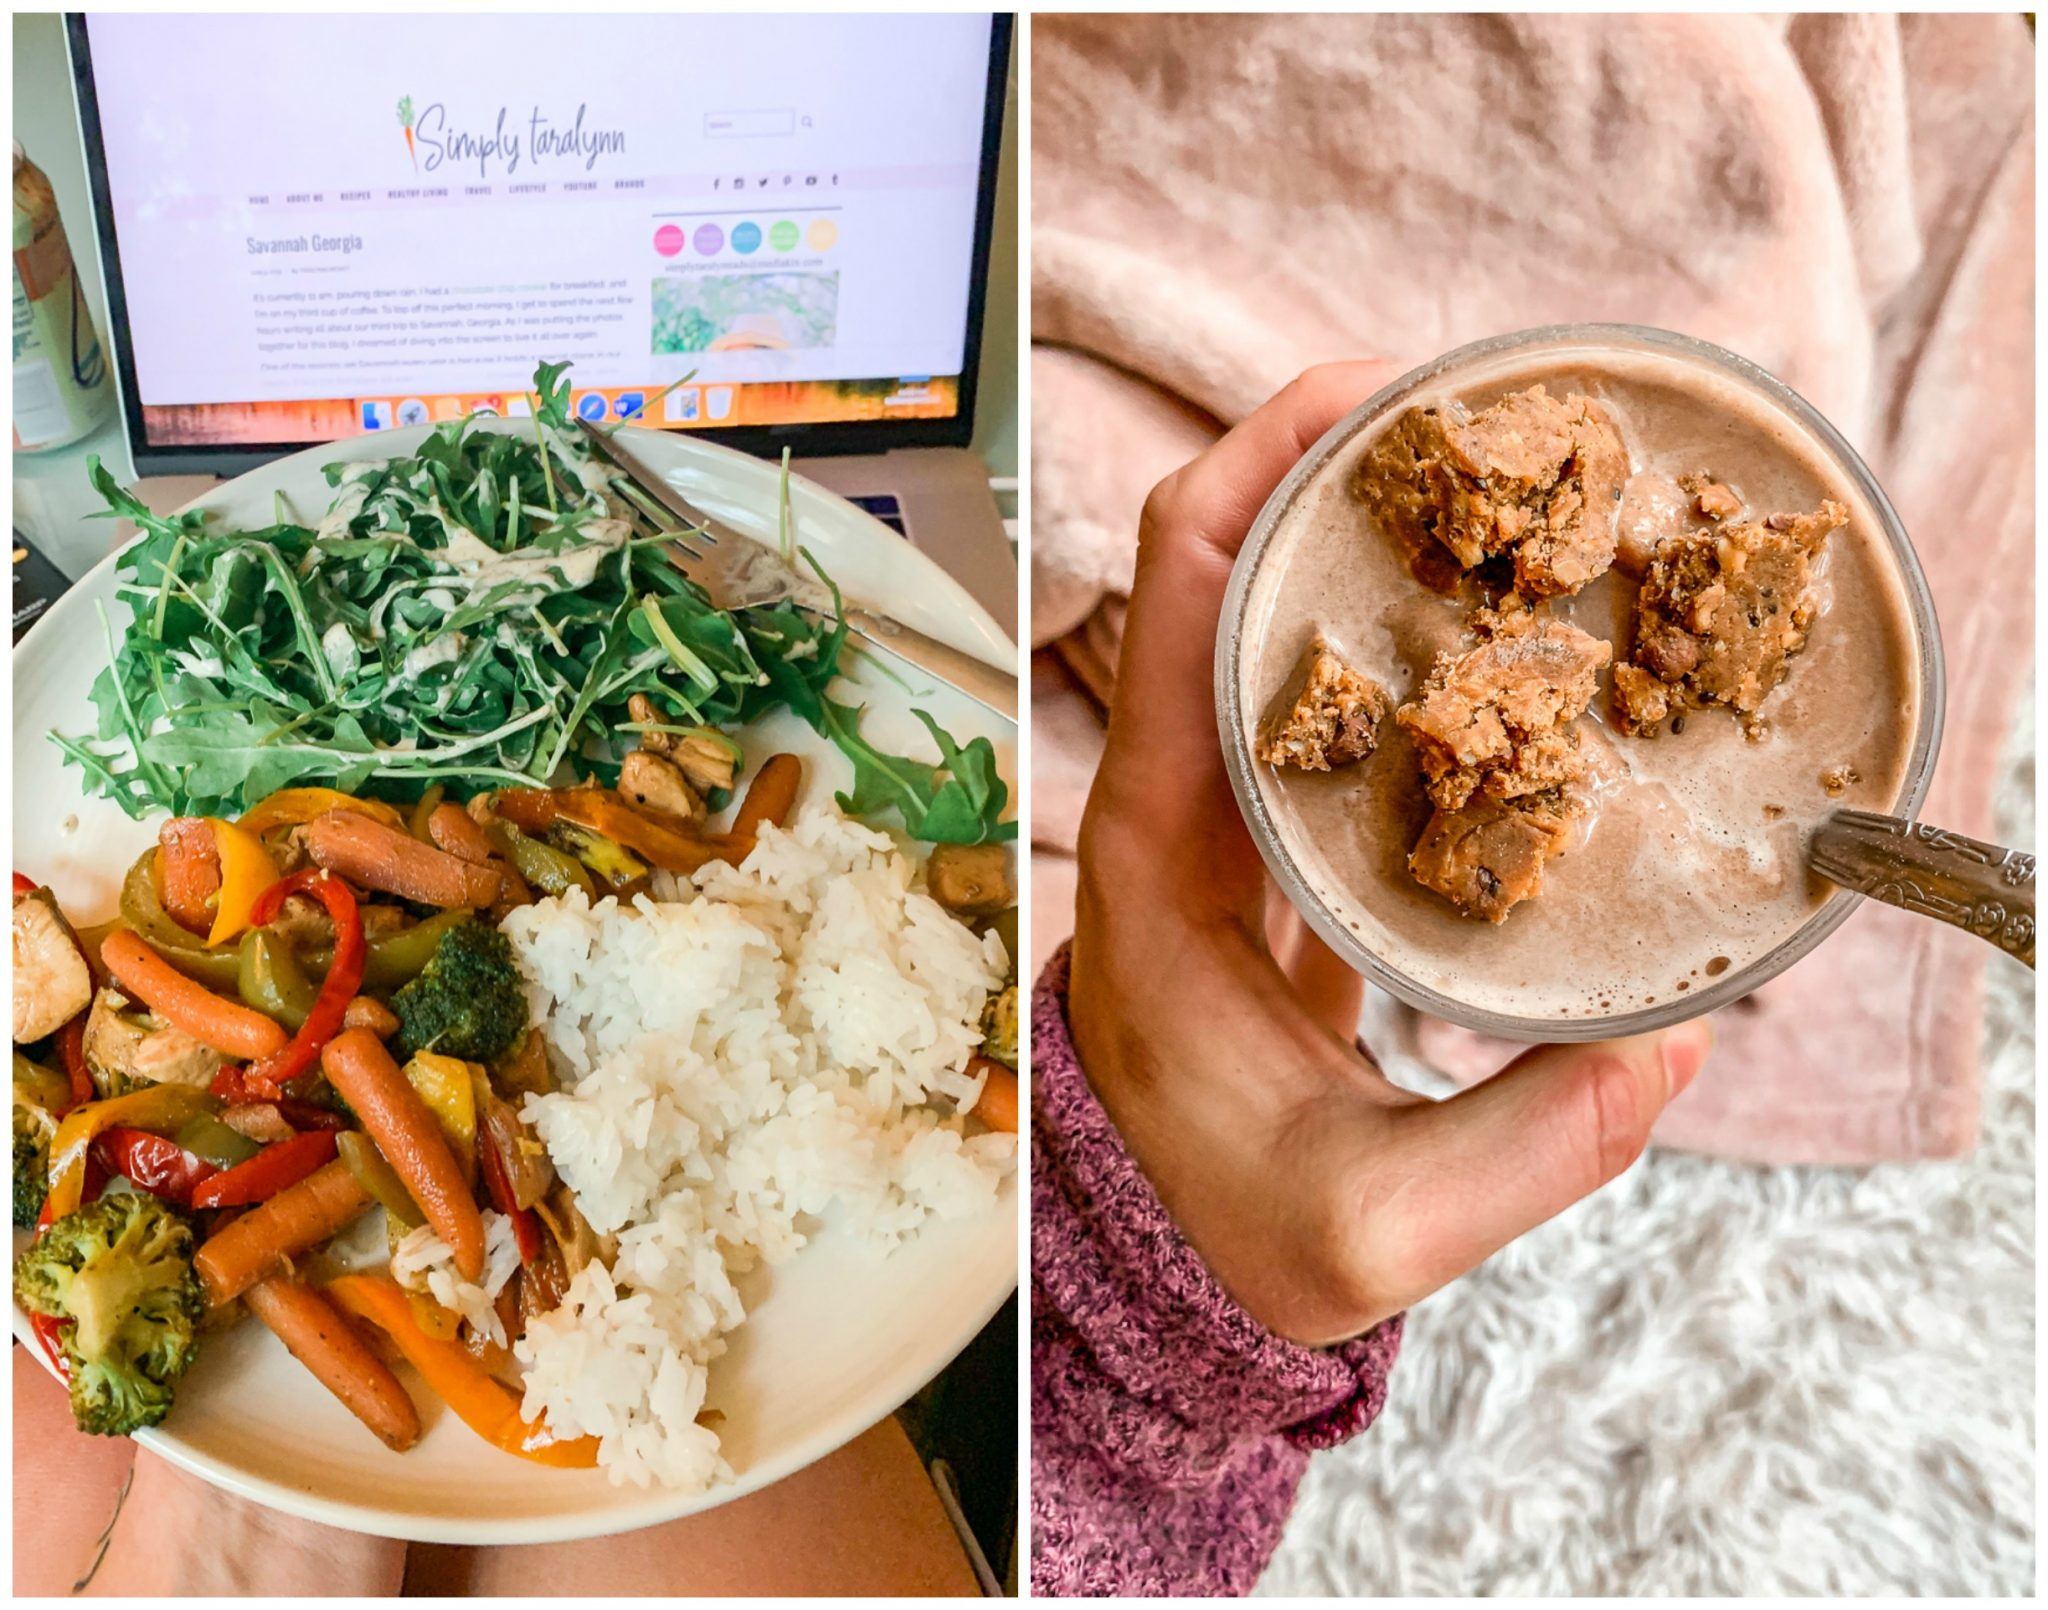 smoothies, weekly recap post, healthy food, lifestyle, rice, salad, stir fry, protein powder, almond milk, gluten free